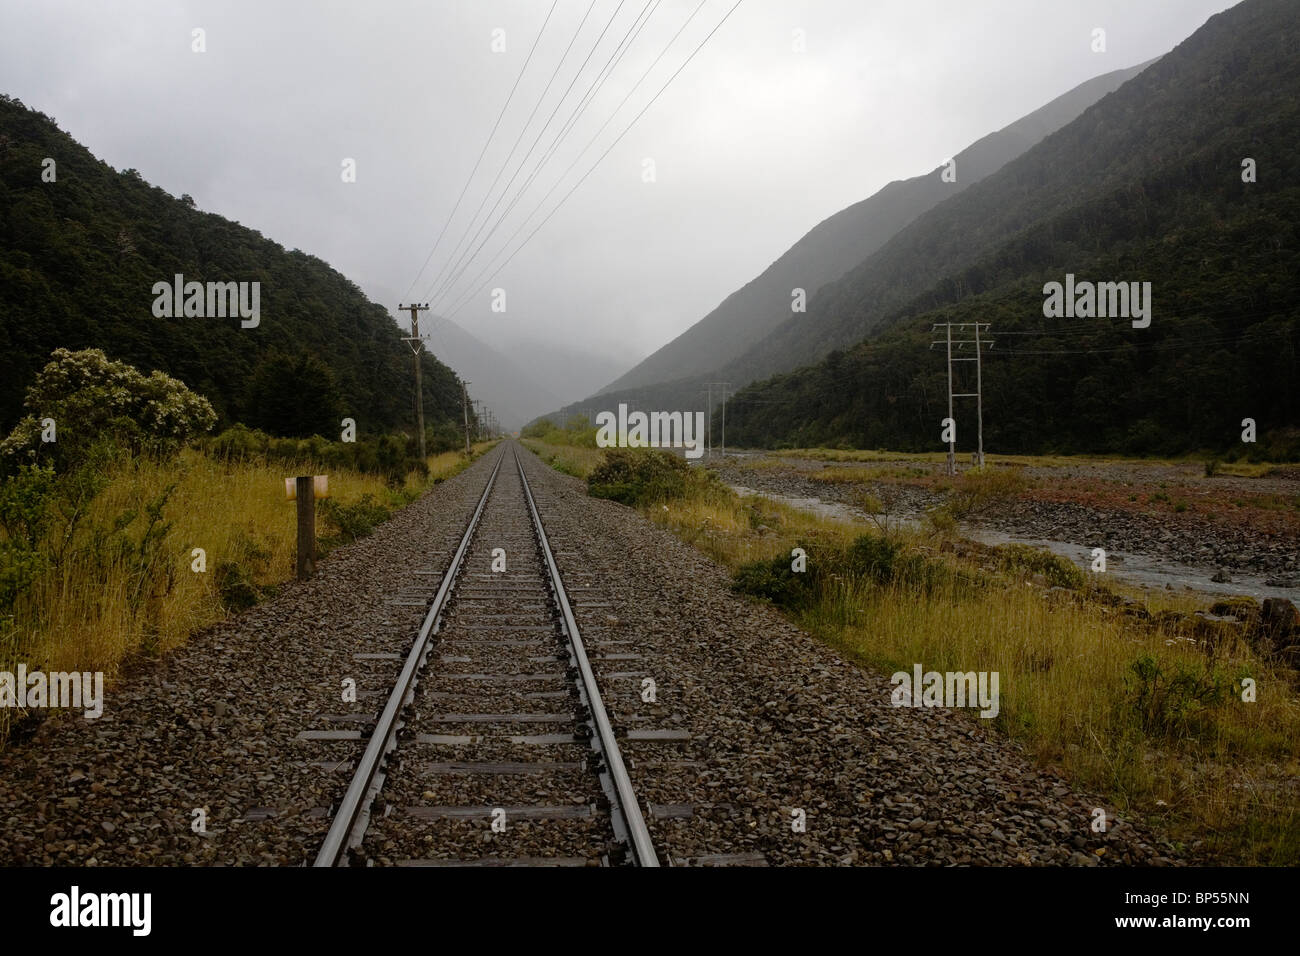 The TranzAlpine railway line going through Arthur's Pass in New Zealand's South Island. - Stock Image